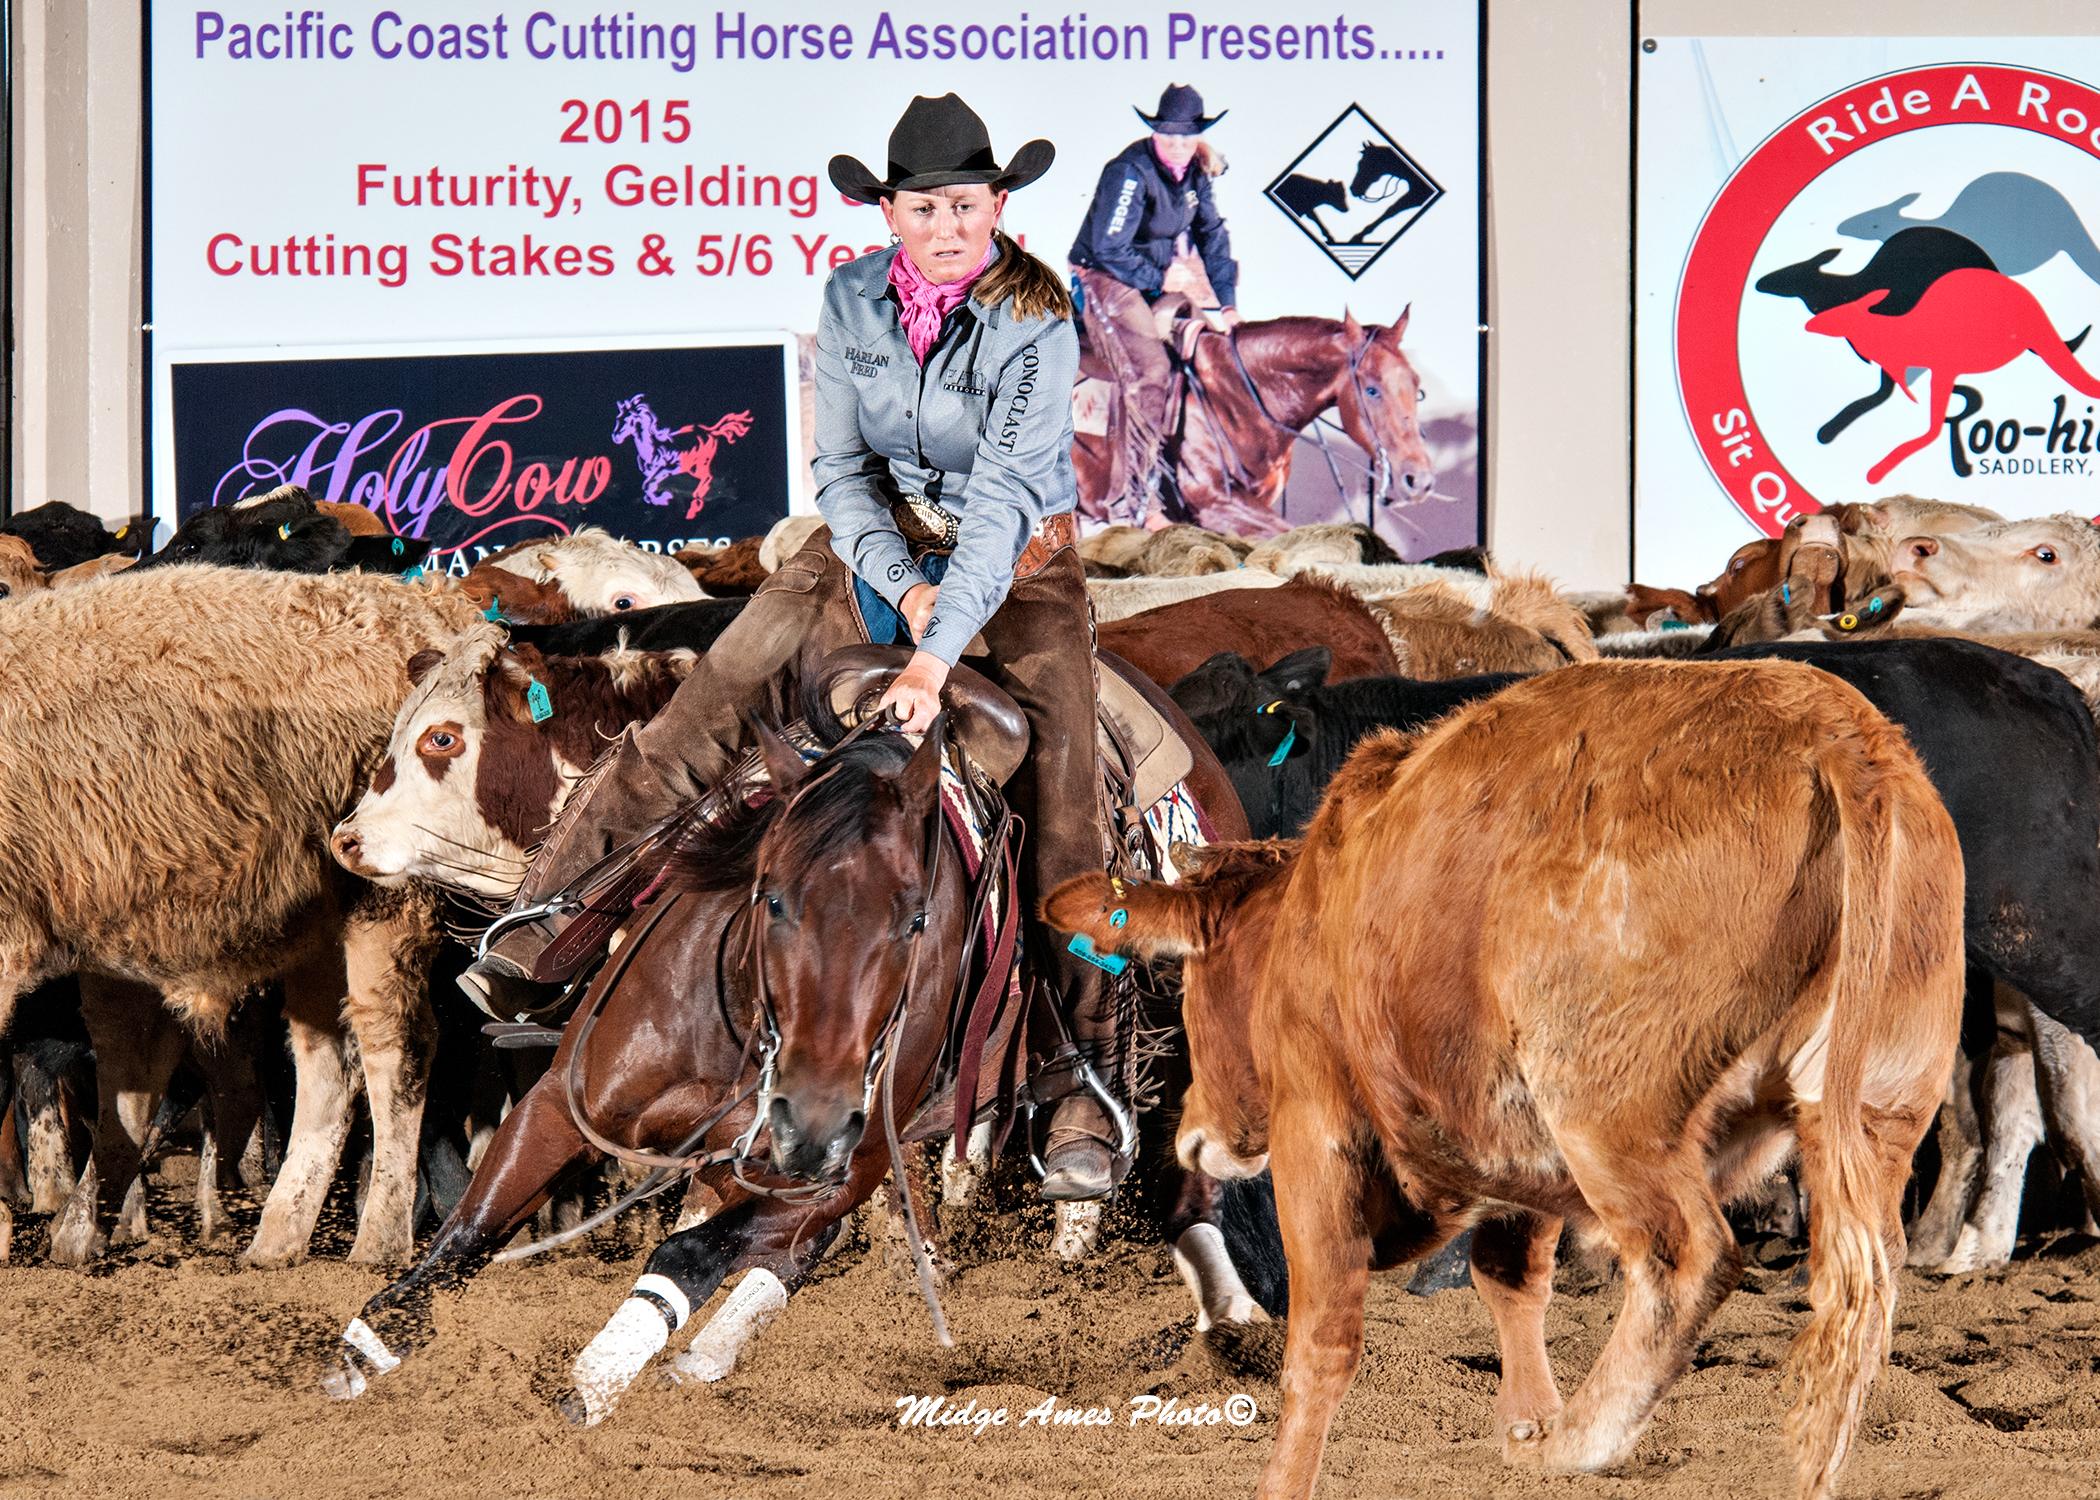 Western Horse Riding Cutting